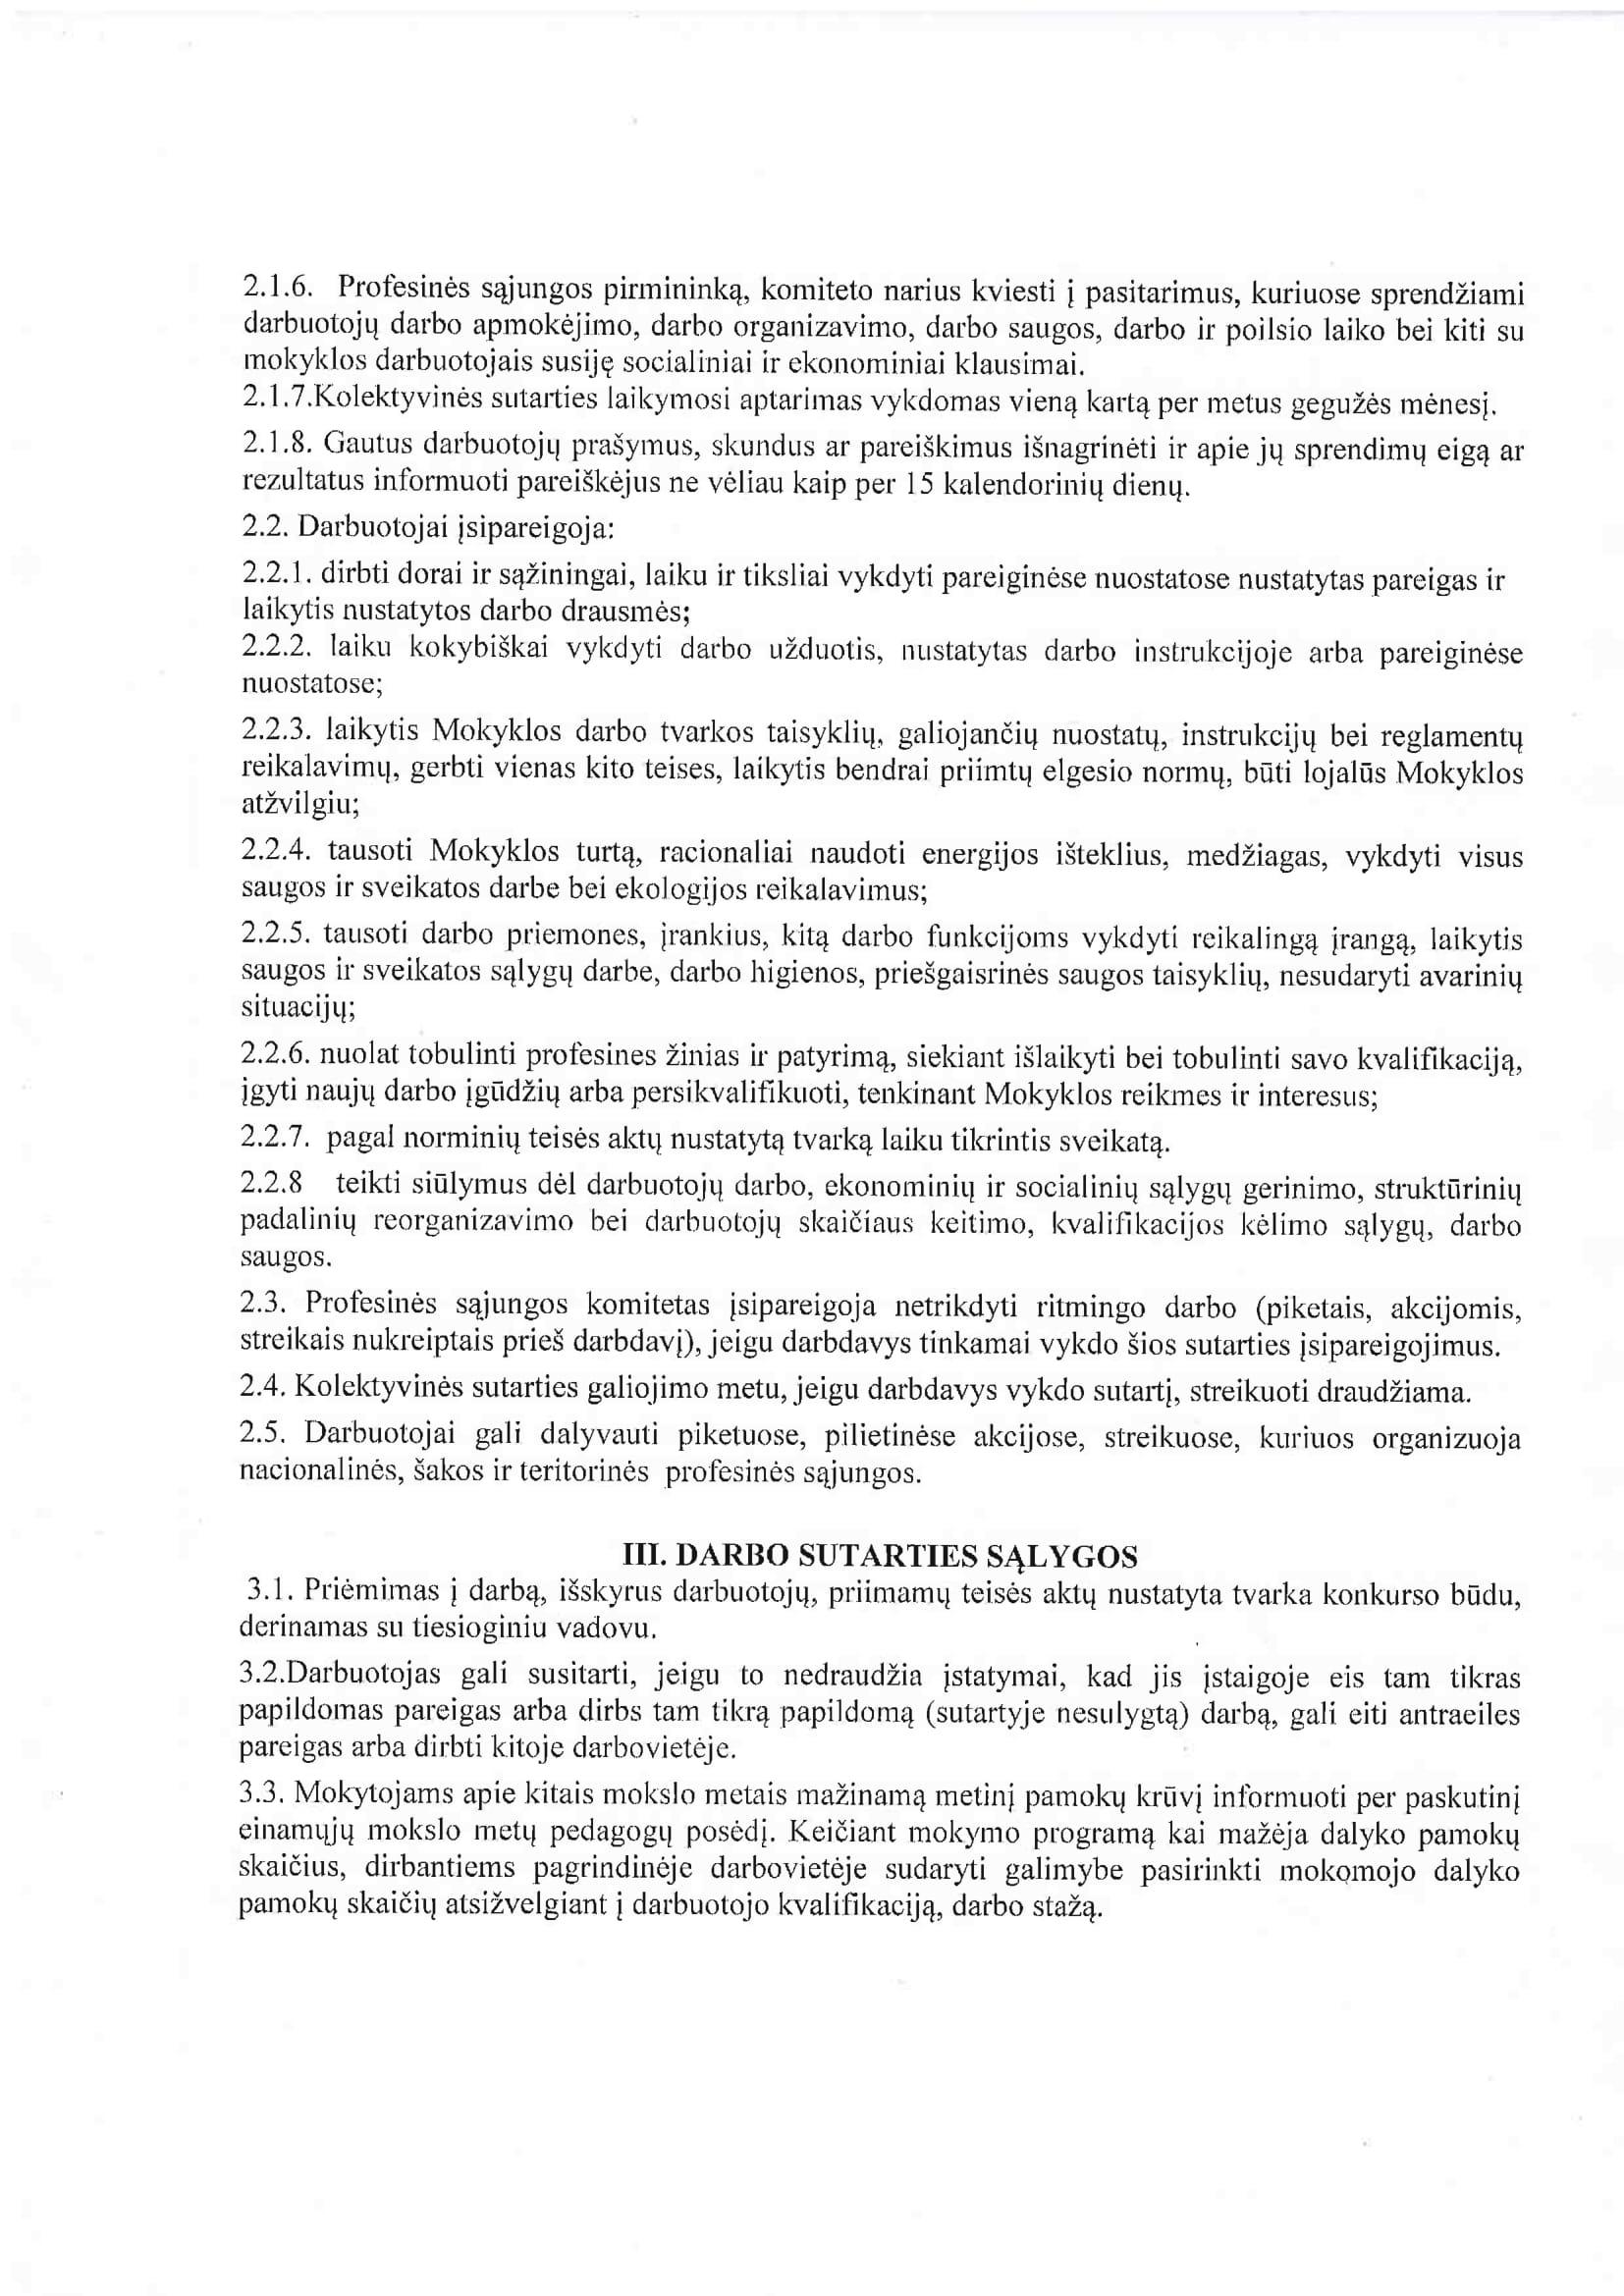 kolektyvine_sutartis-2